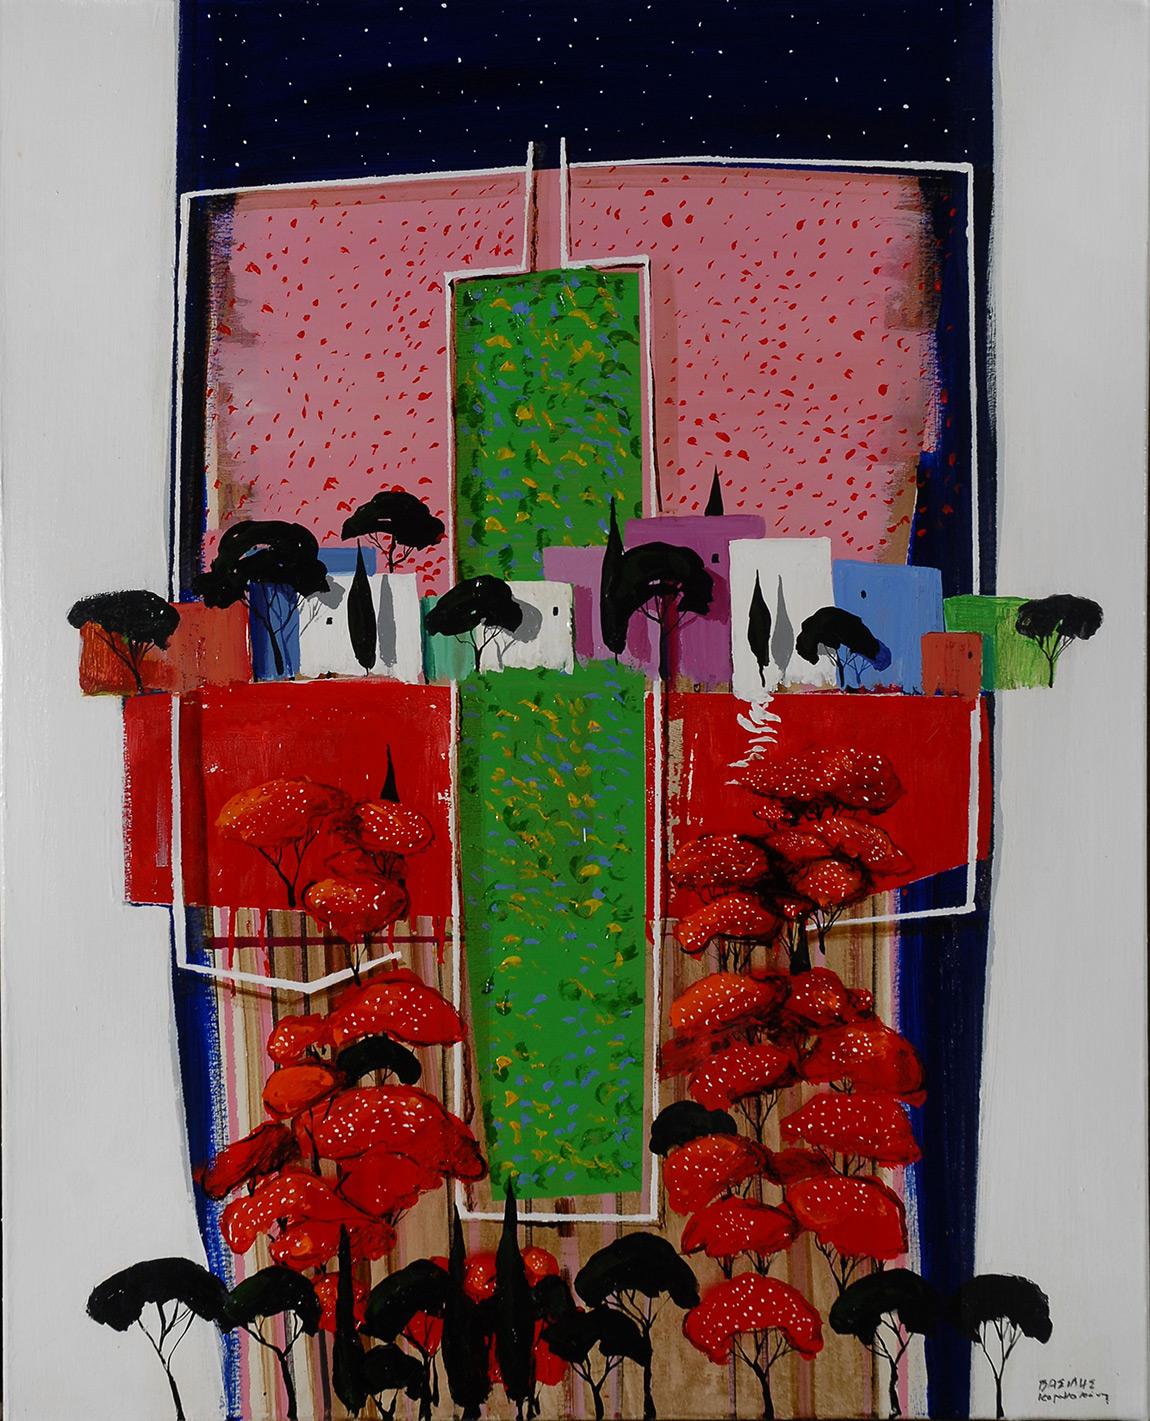 Vassilis Karakatsanis, The Unknown Land, 2011, acrylics & oil on canvas, 100 x 80 cm